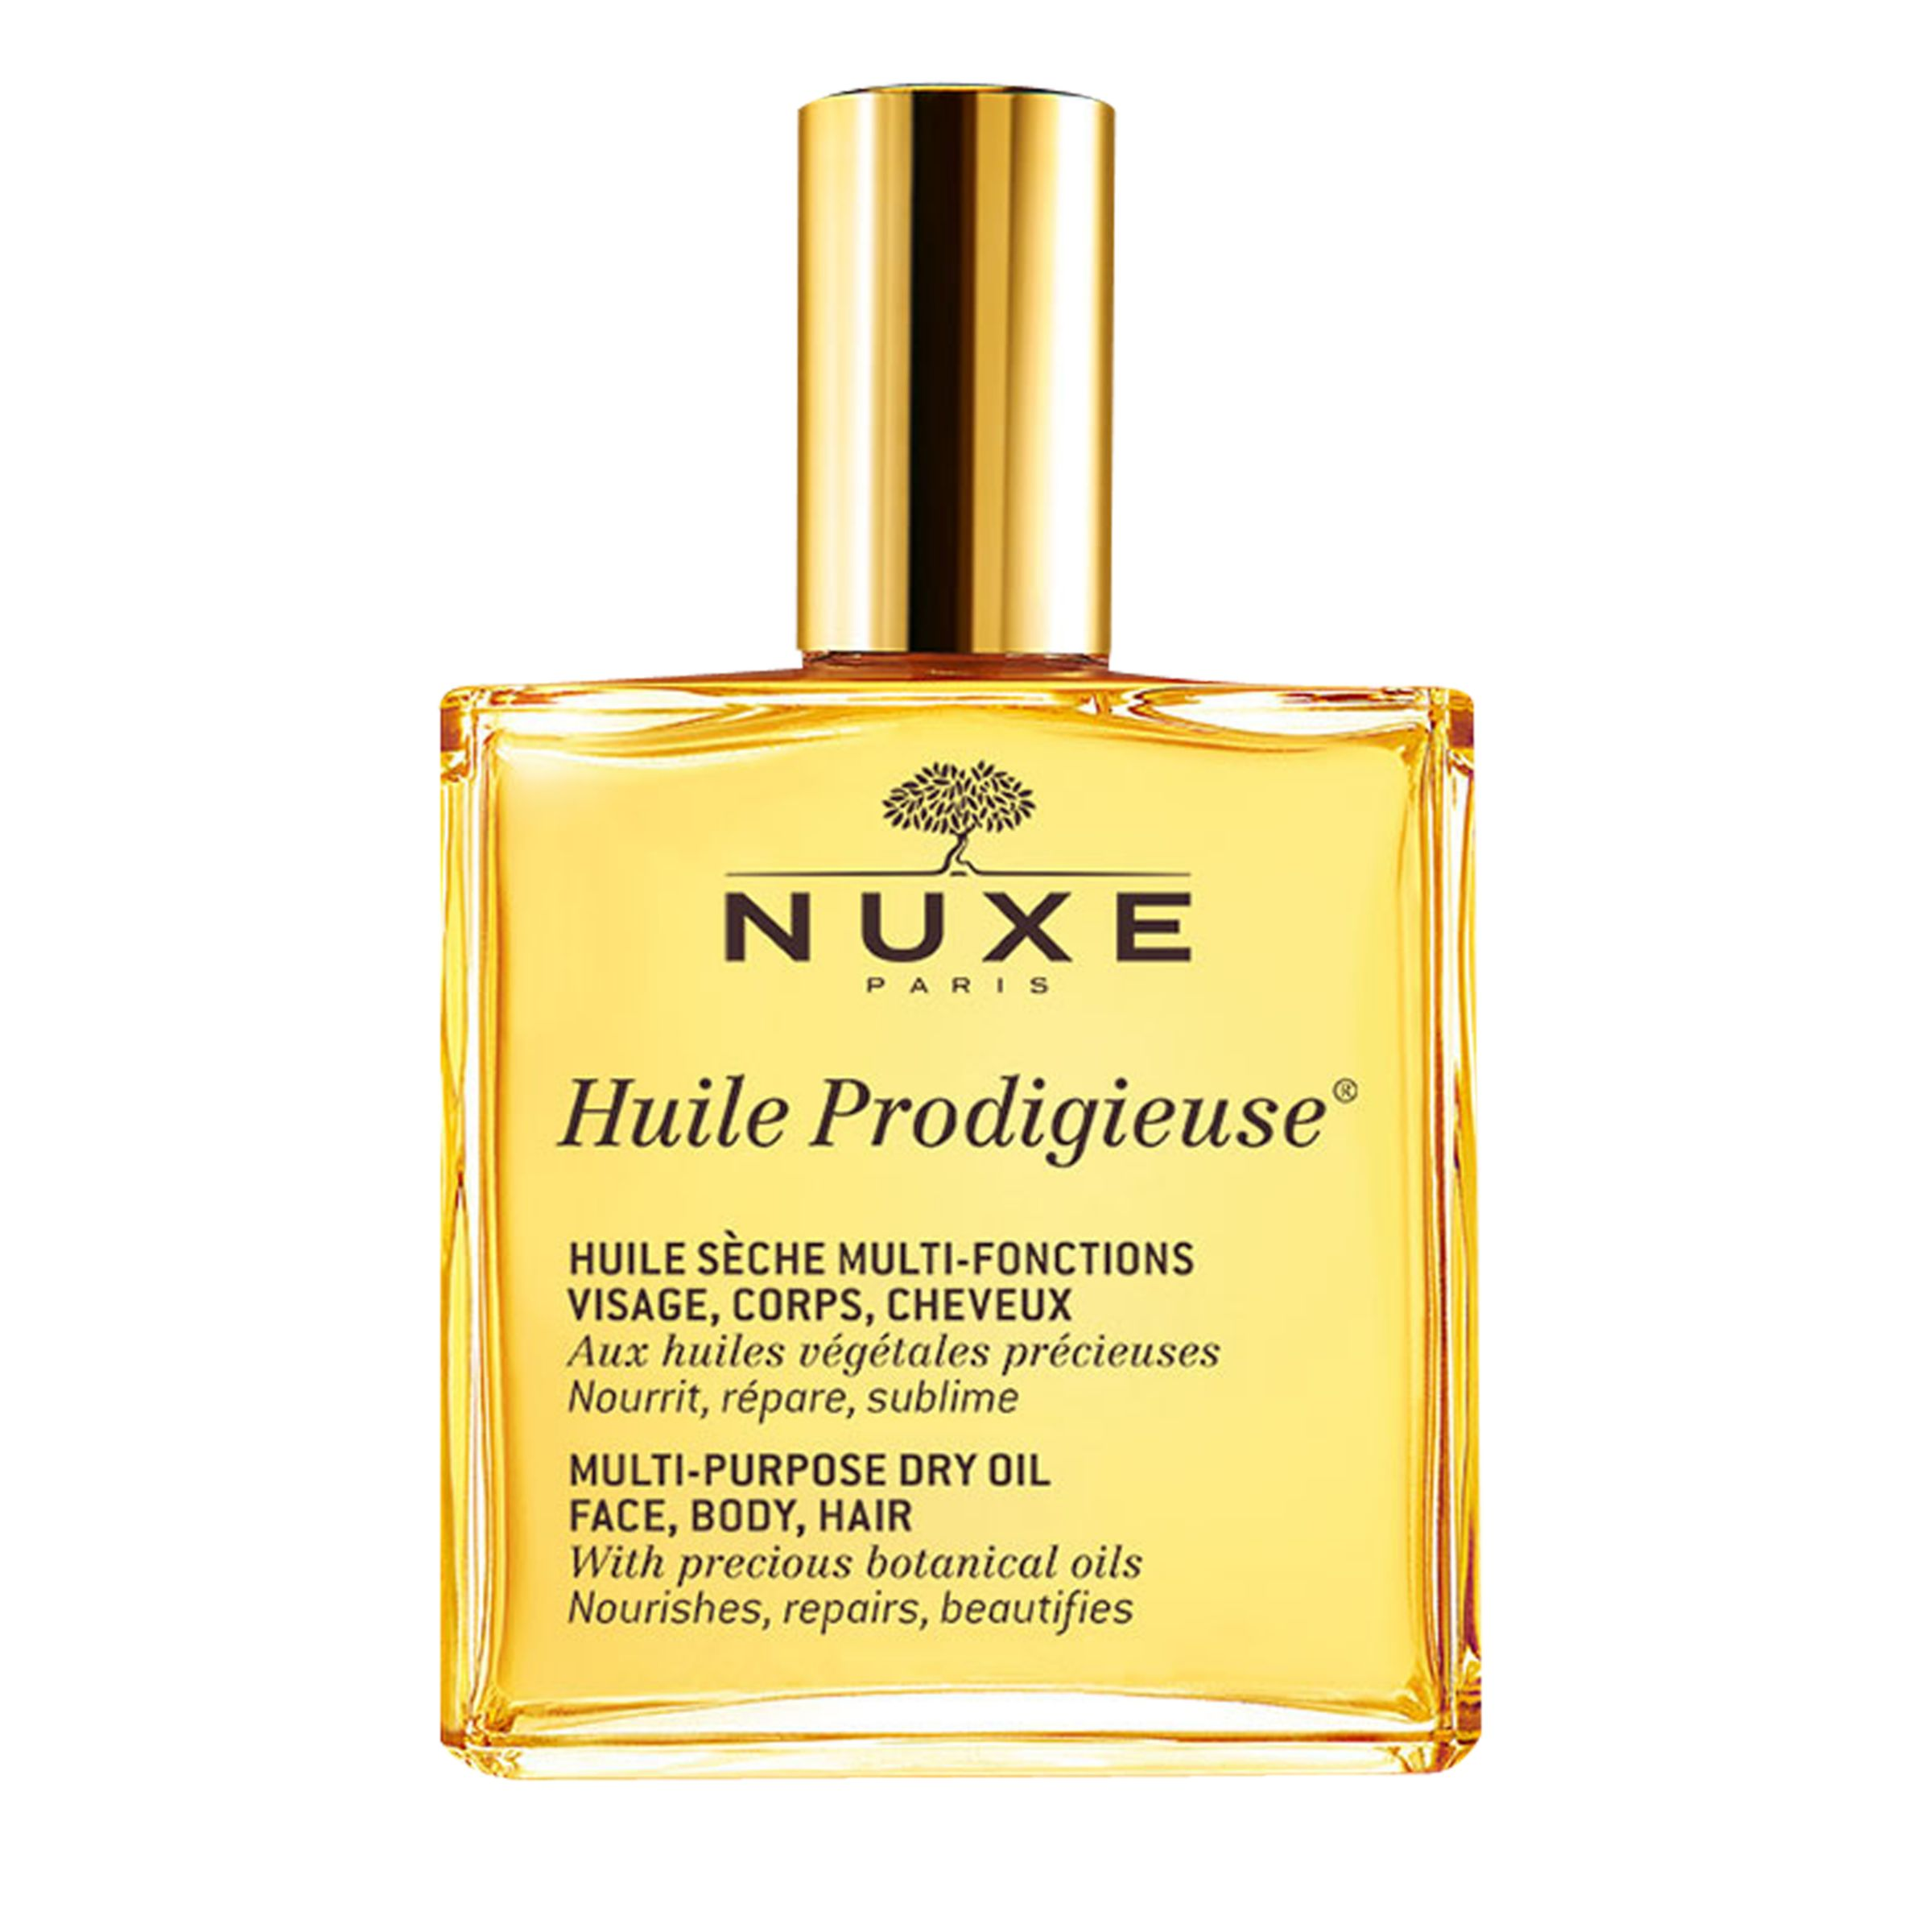 Nuxe NUXE Dry Oil Huile Prodigieuse® Spray Bottle, 100ml